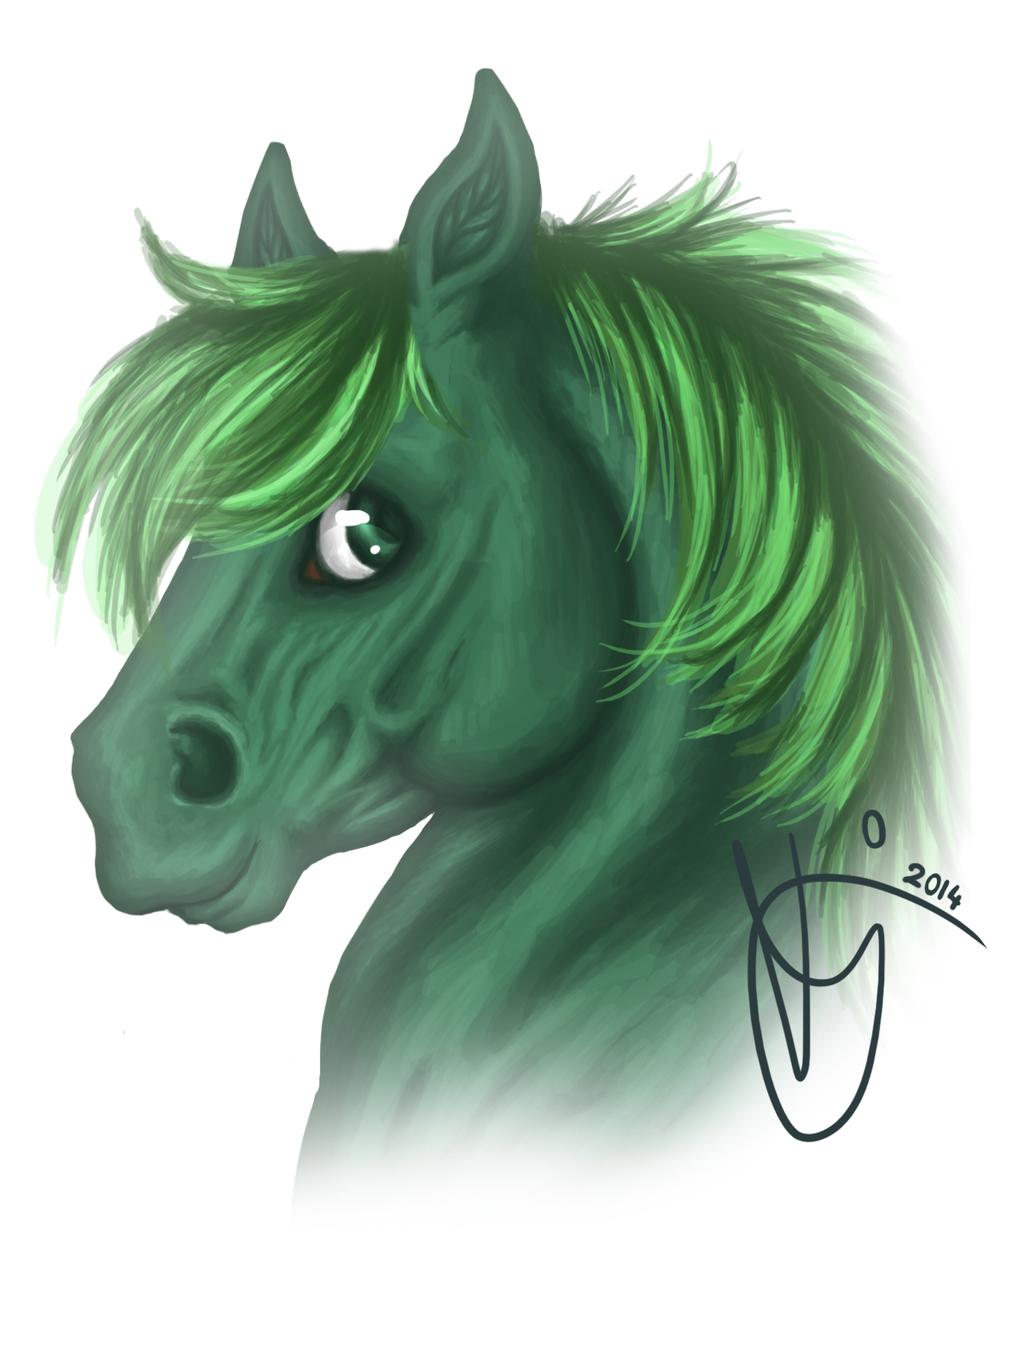 Chibi horse painting